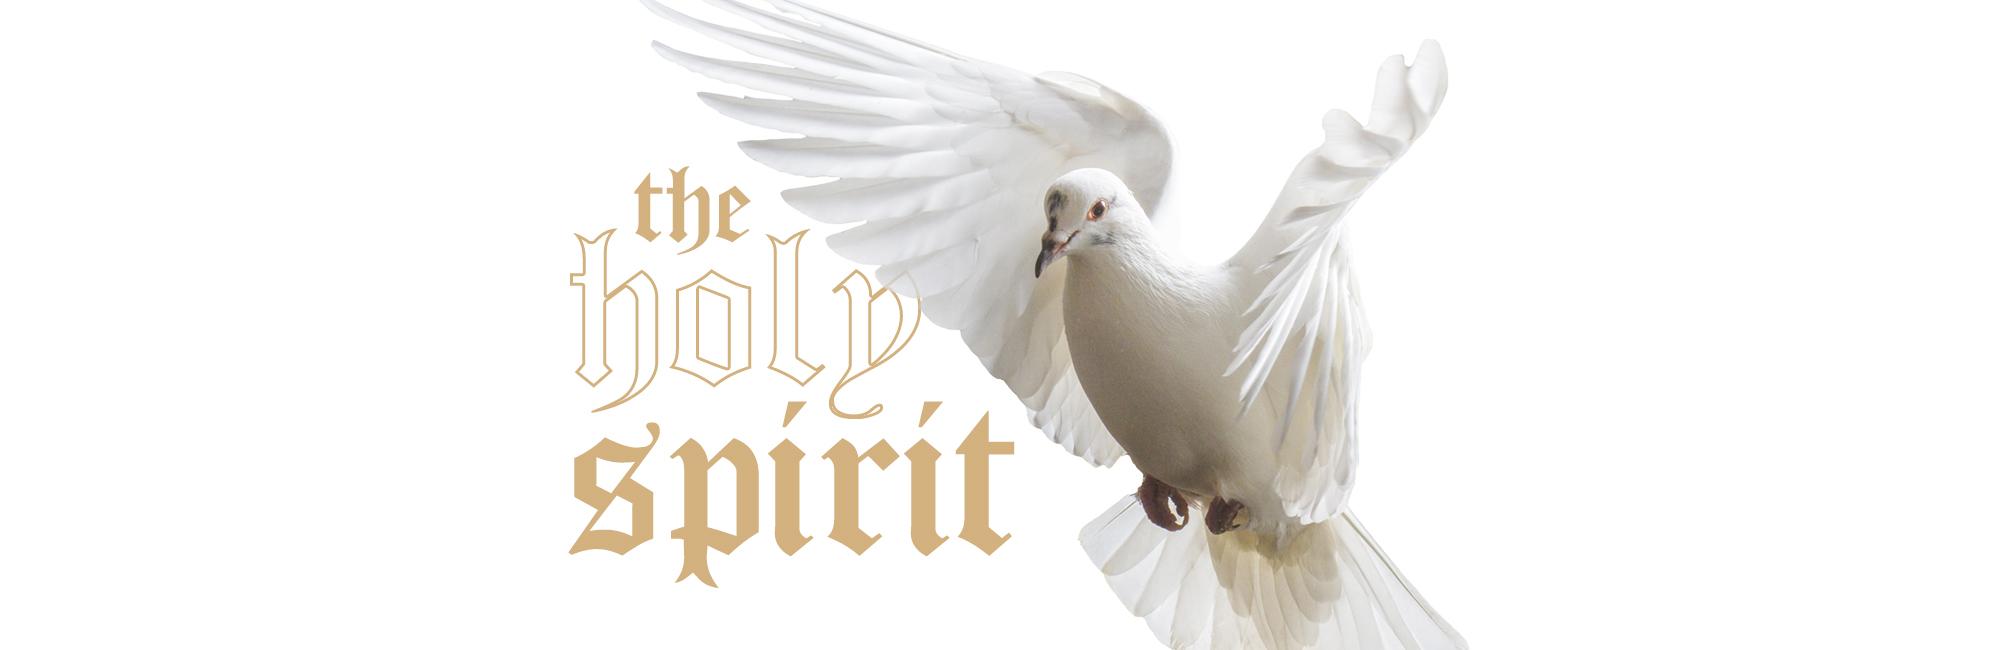 The Holy Spirit - Web - Message Header